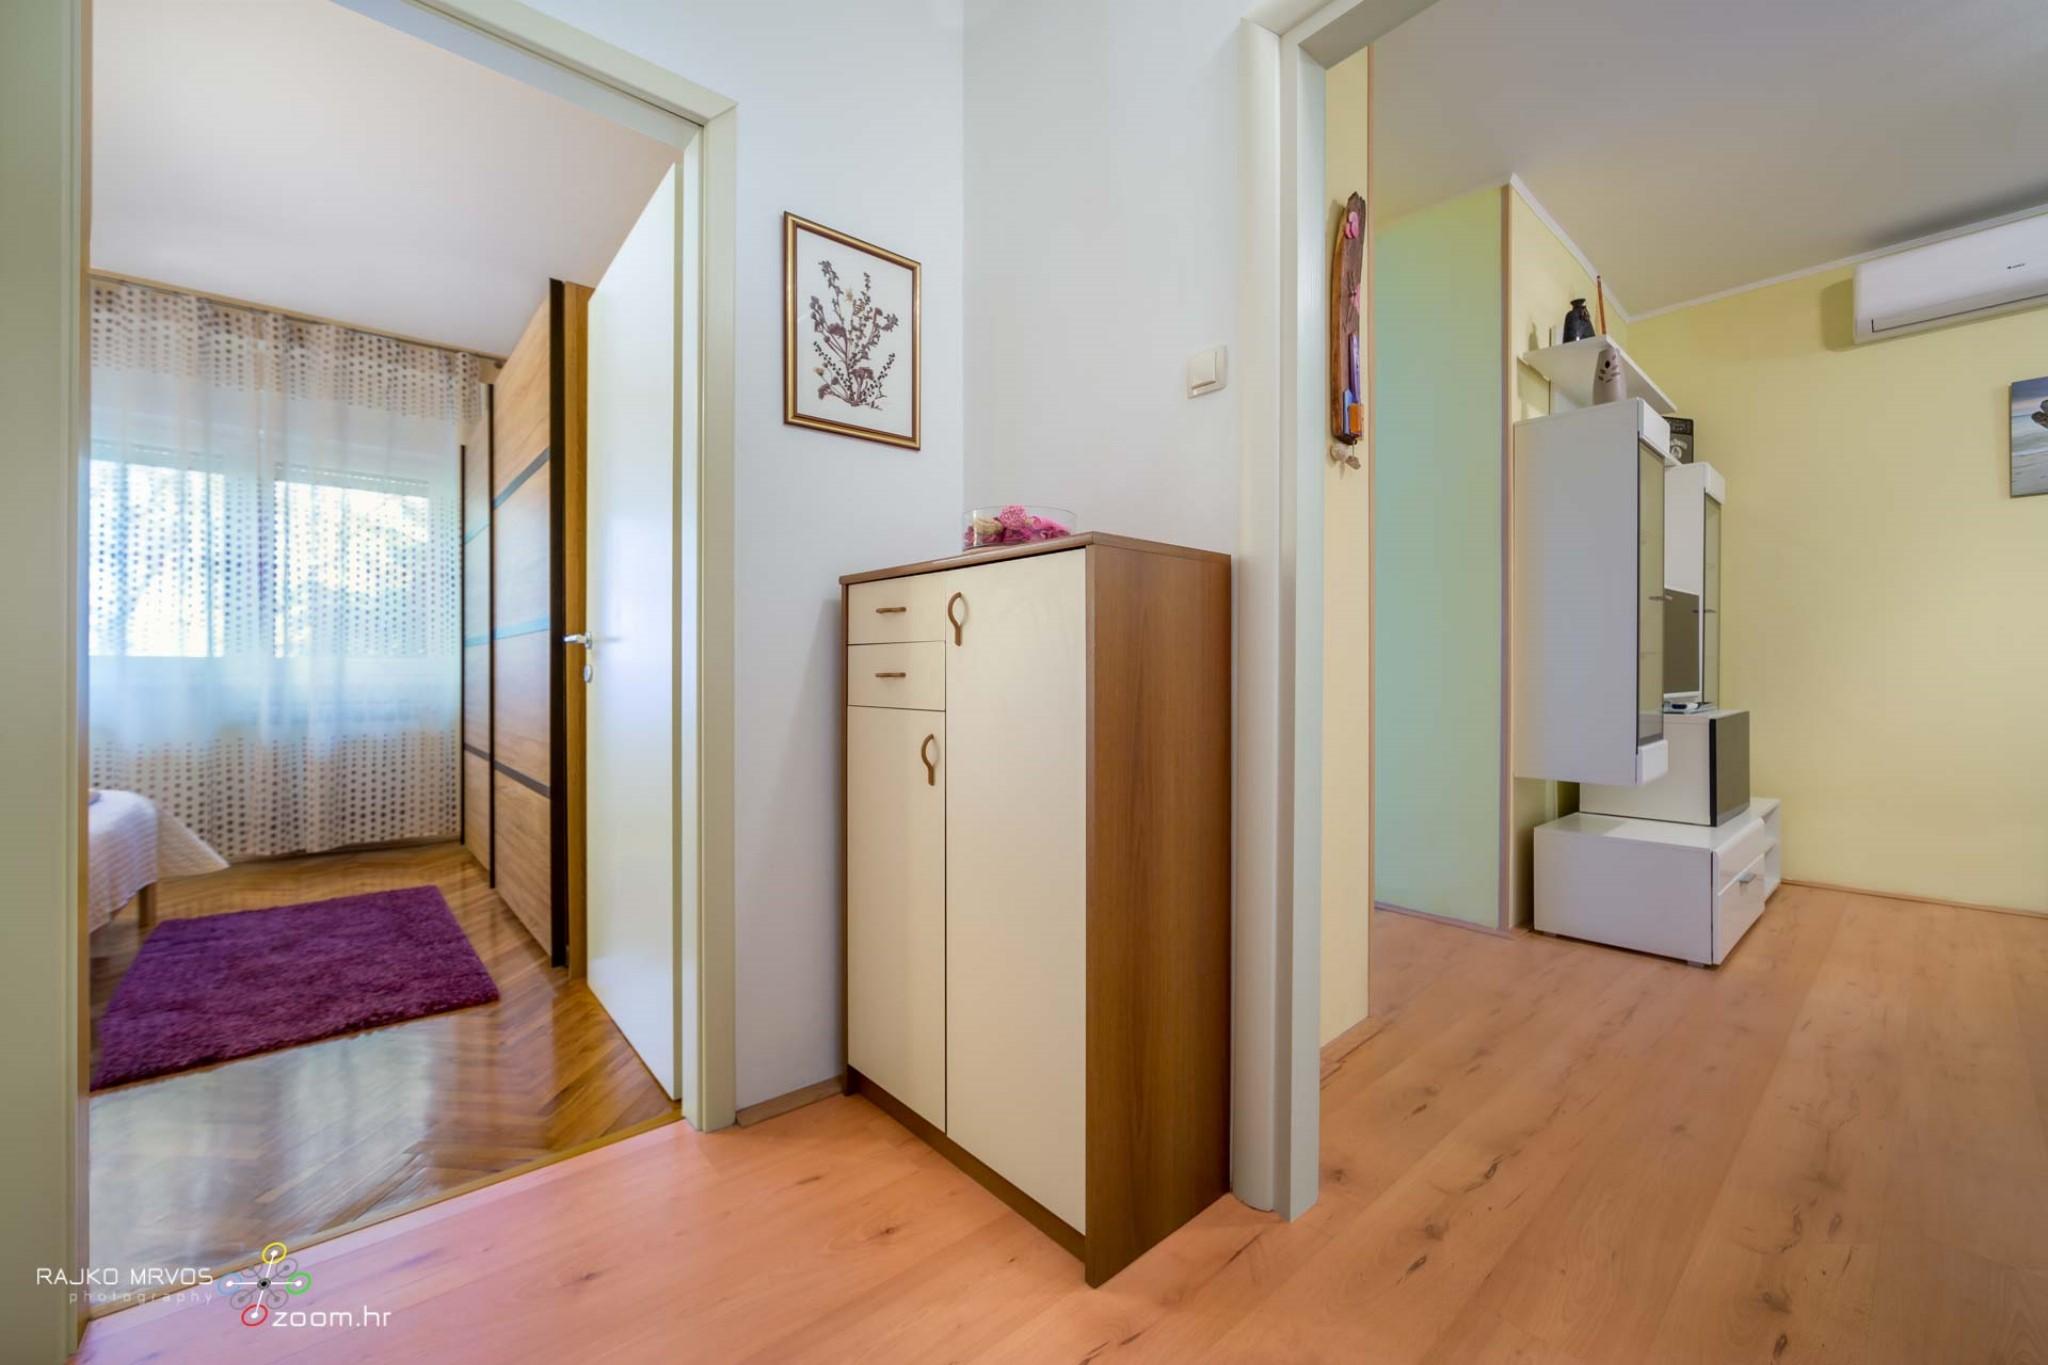 fotografiranje-interijera-fotograf-eksterijera-vila-apartmana-kuca-apartmani-Dujmic-21